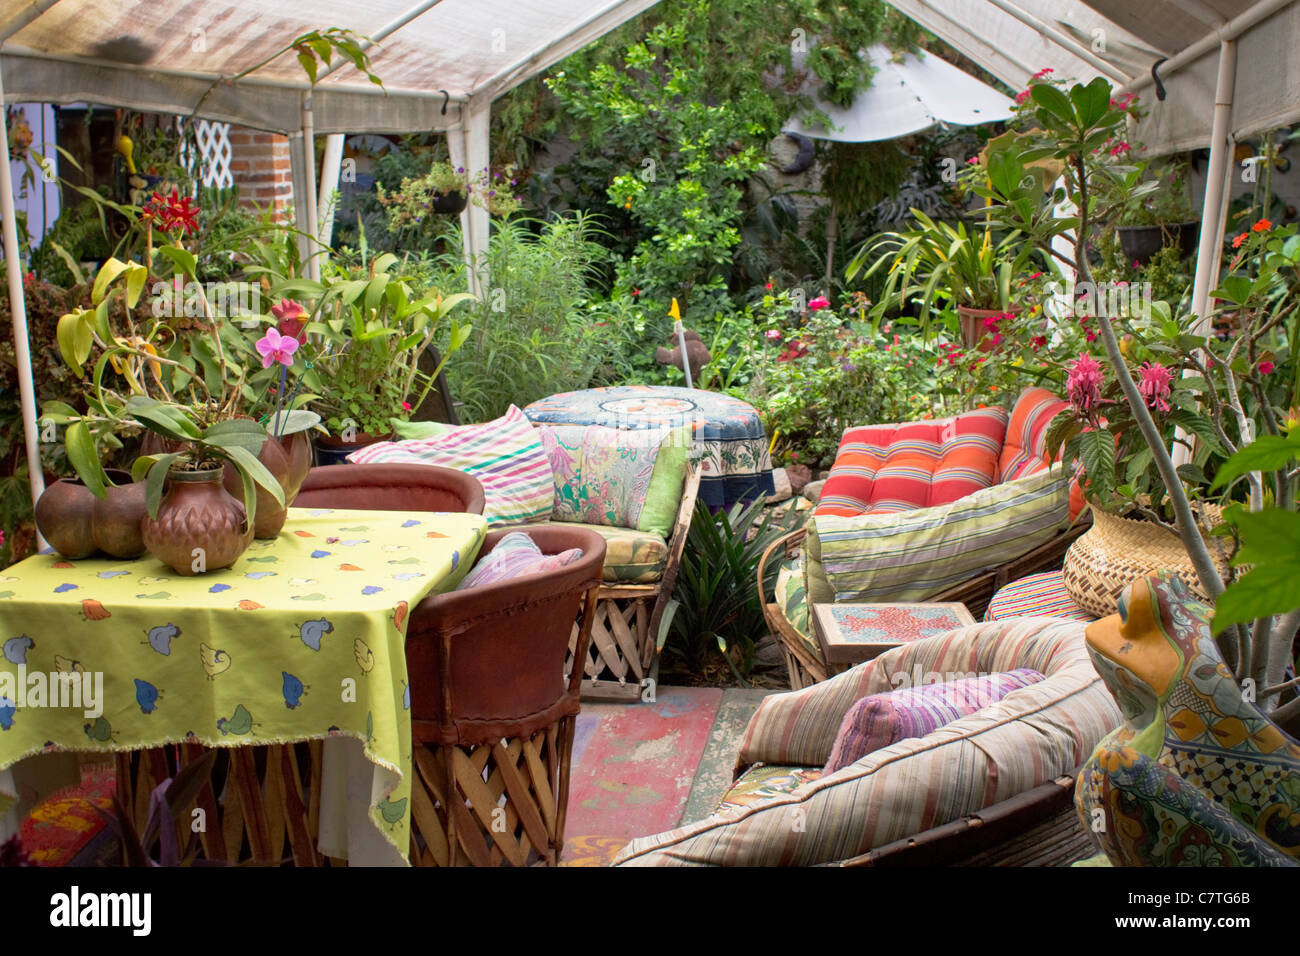 Potted Plants Patio Garden Indoor Outdoor Lifestyle Ajijic Stock Photo Alamy